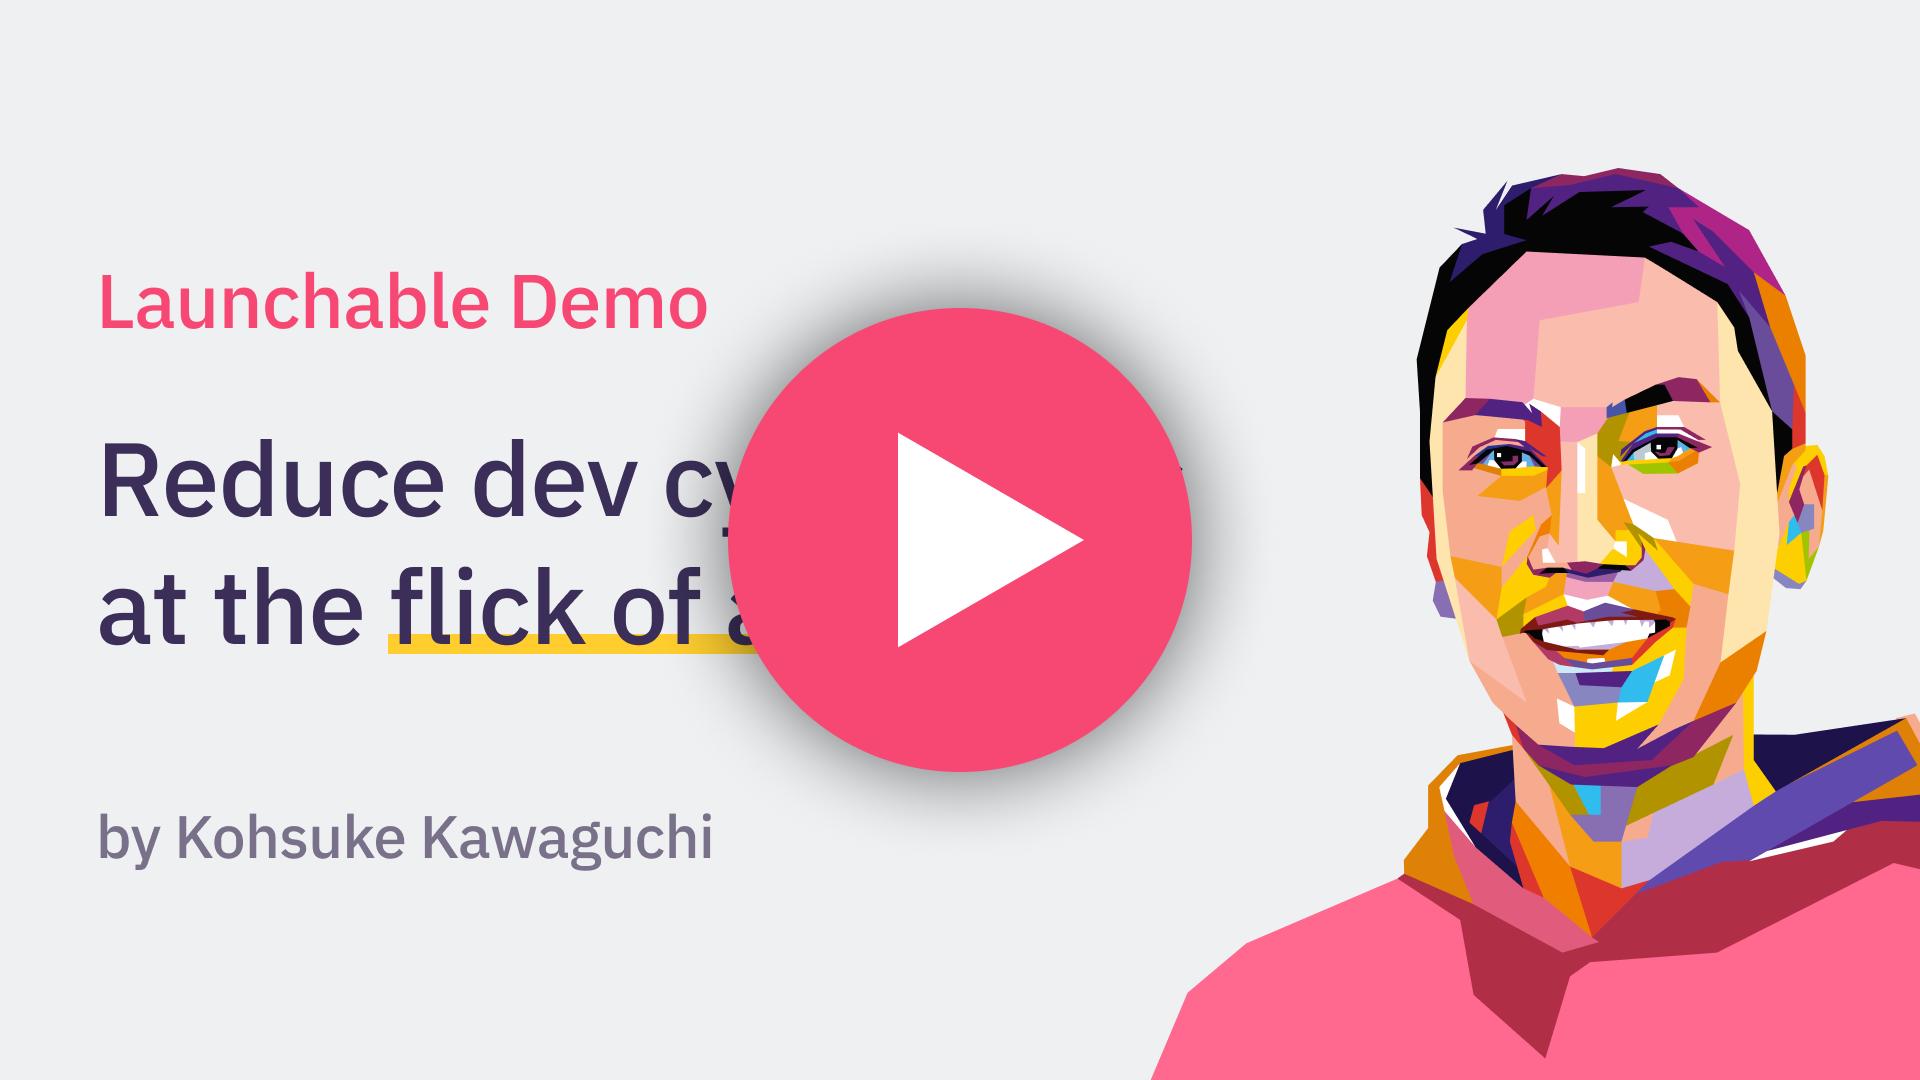 Kohsuke demos Launchable: reducing cycle times